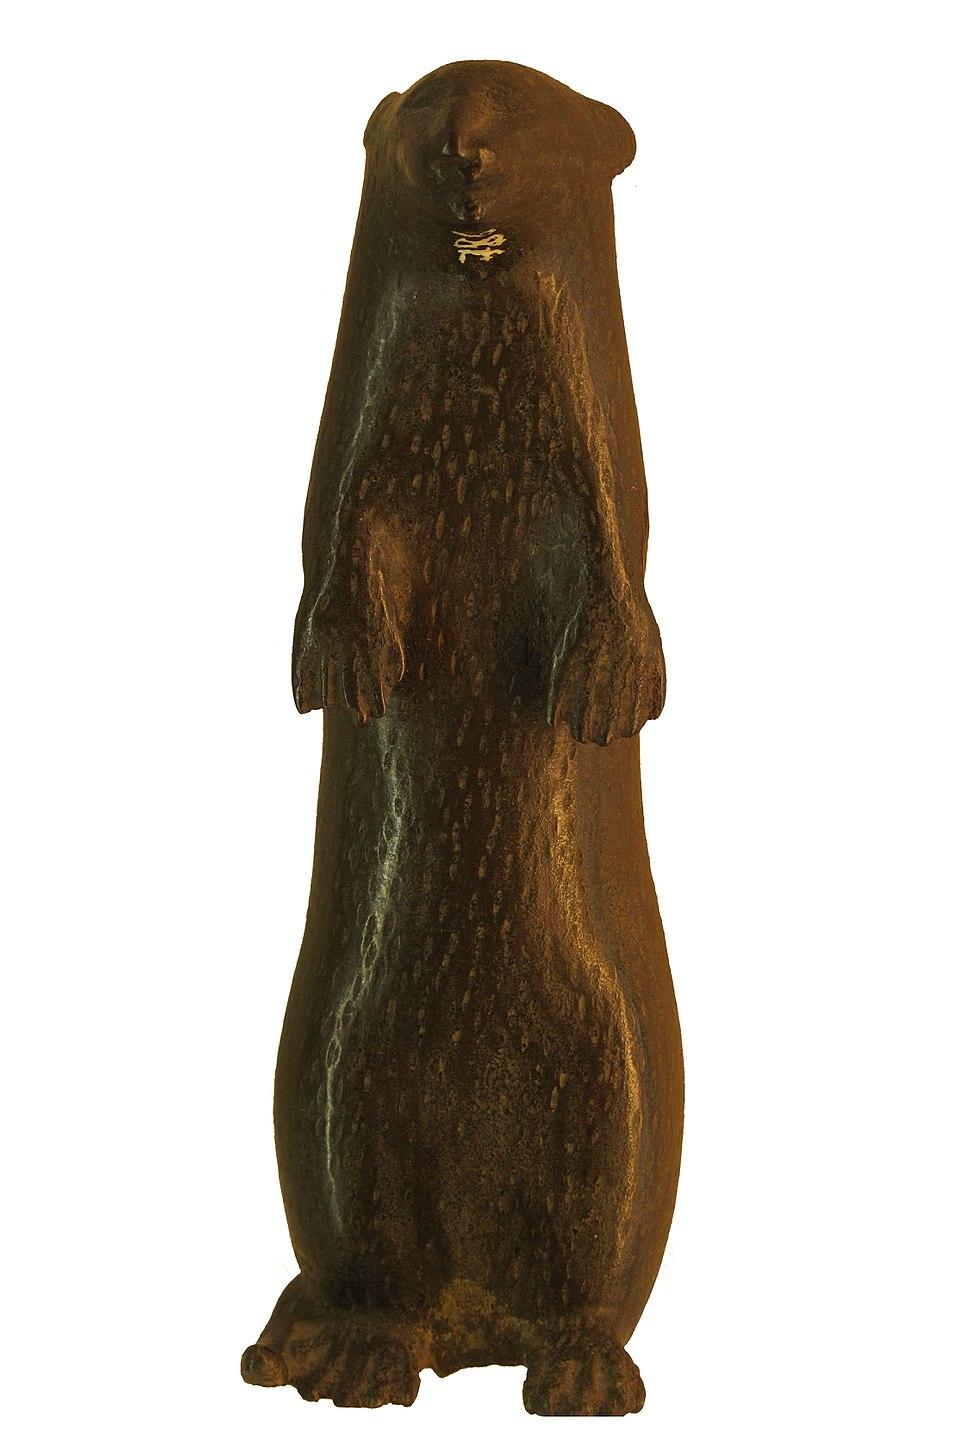 Egyptian mongoose-IMG 6334